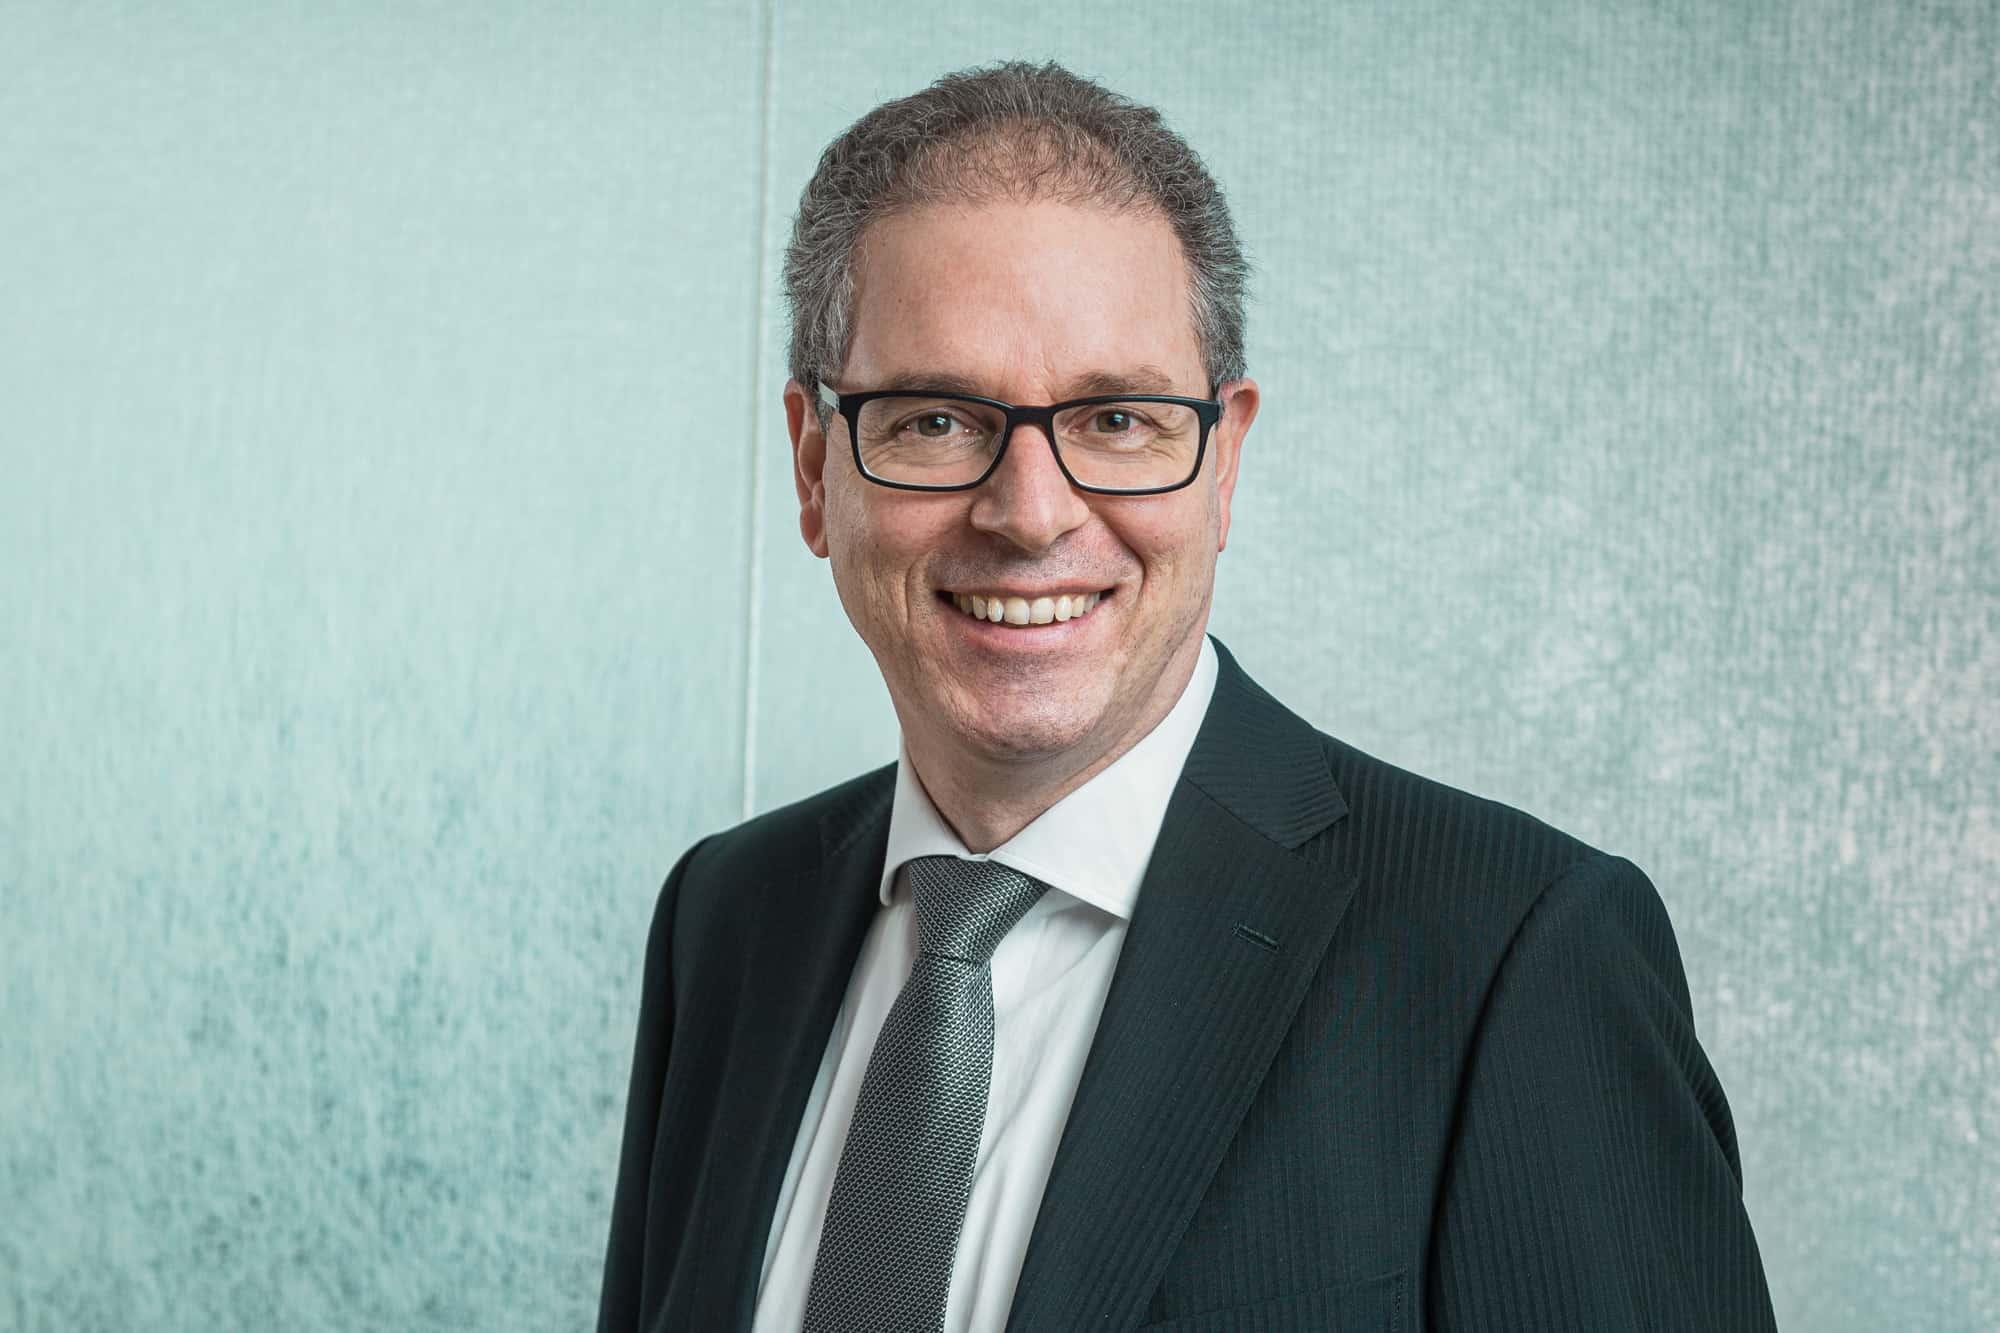 Patrick Schwyn